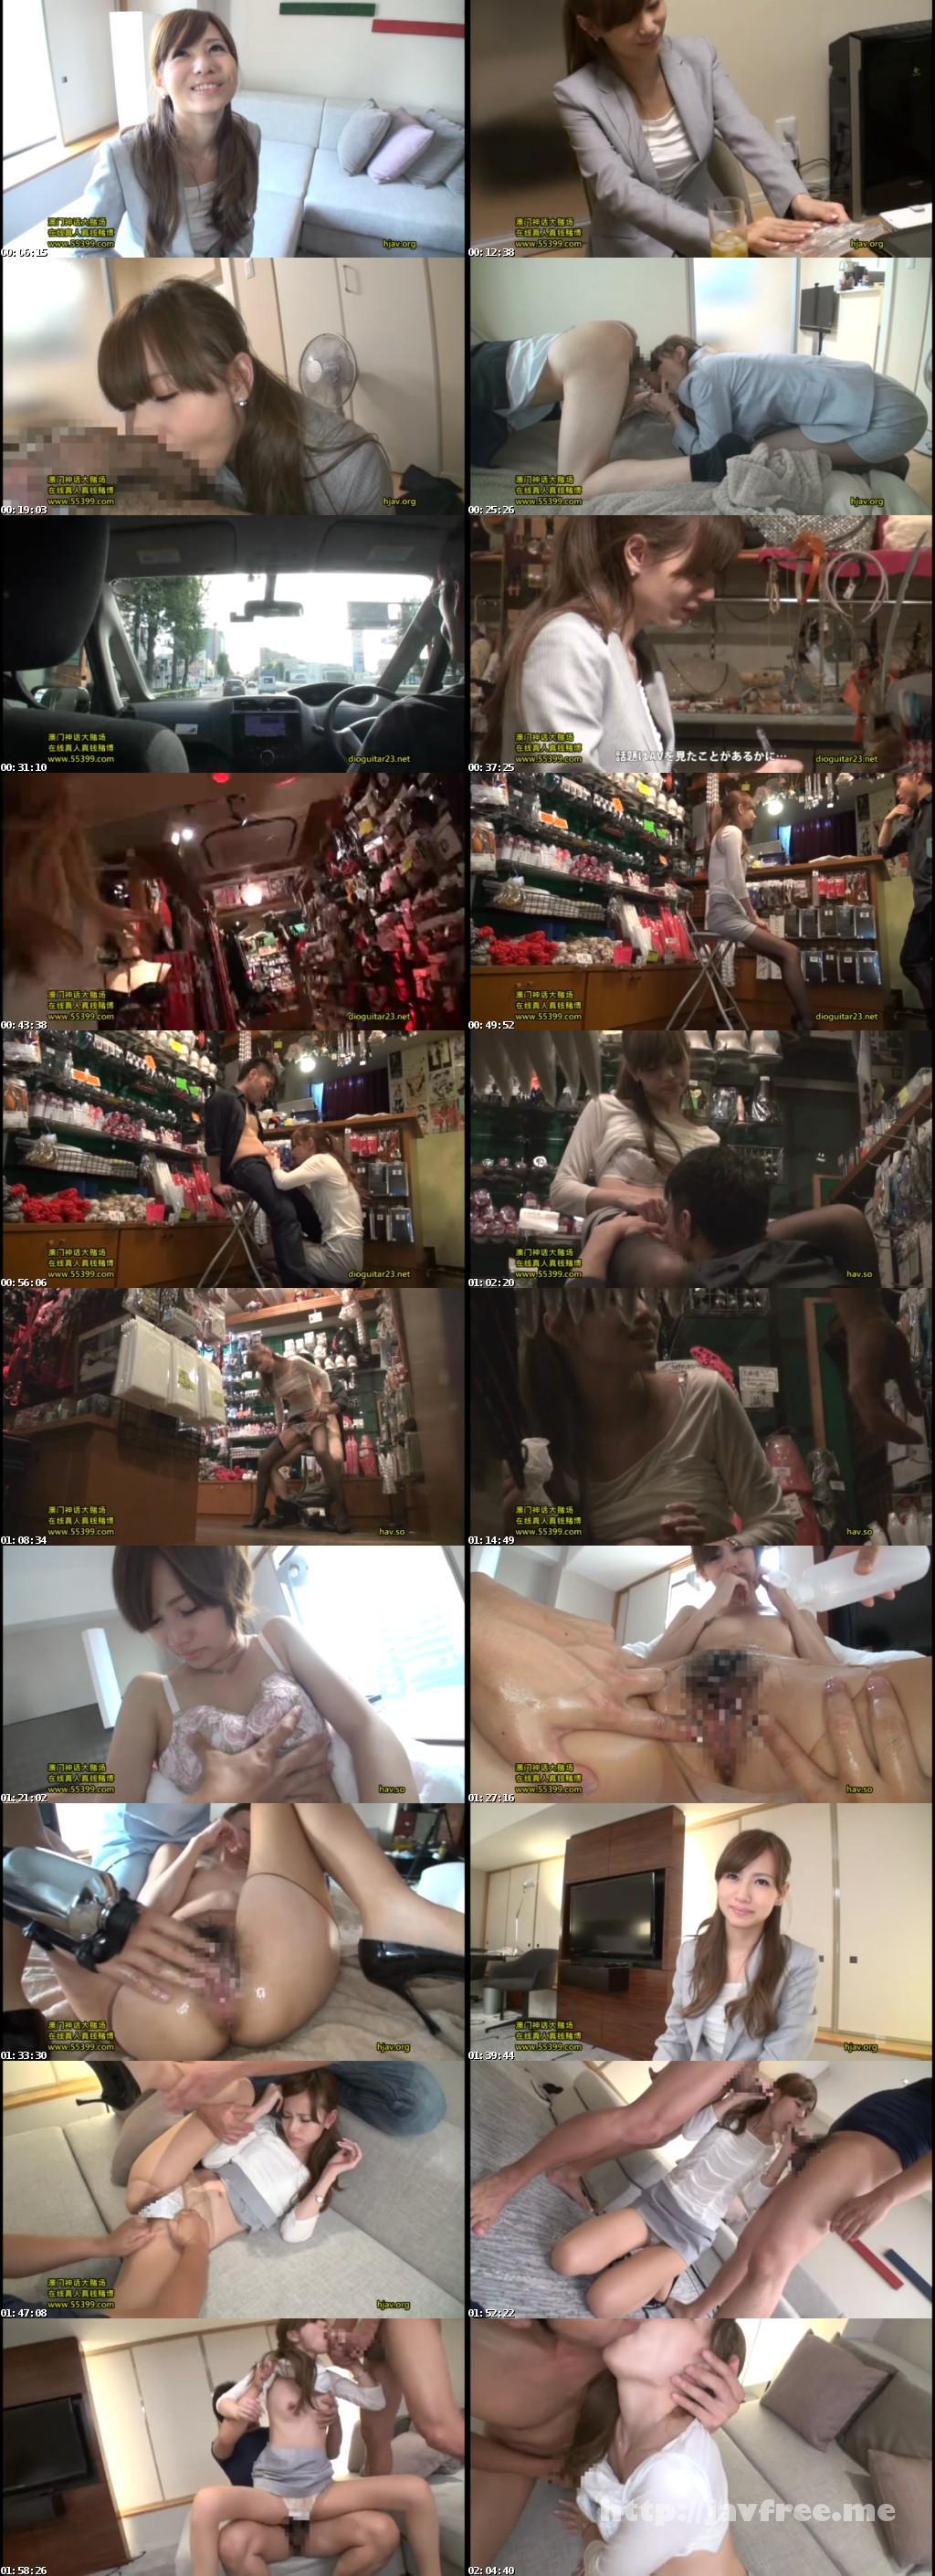 [JBS 009] 働くオンナ3 橋本涼 SPECIAL SP.01 橋本涼 JBS